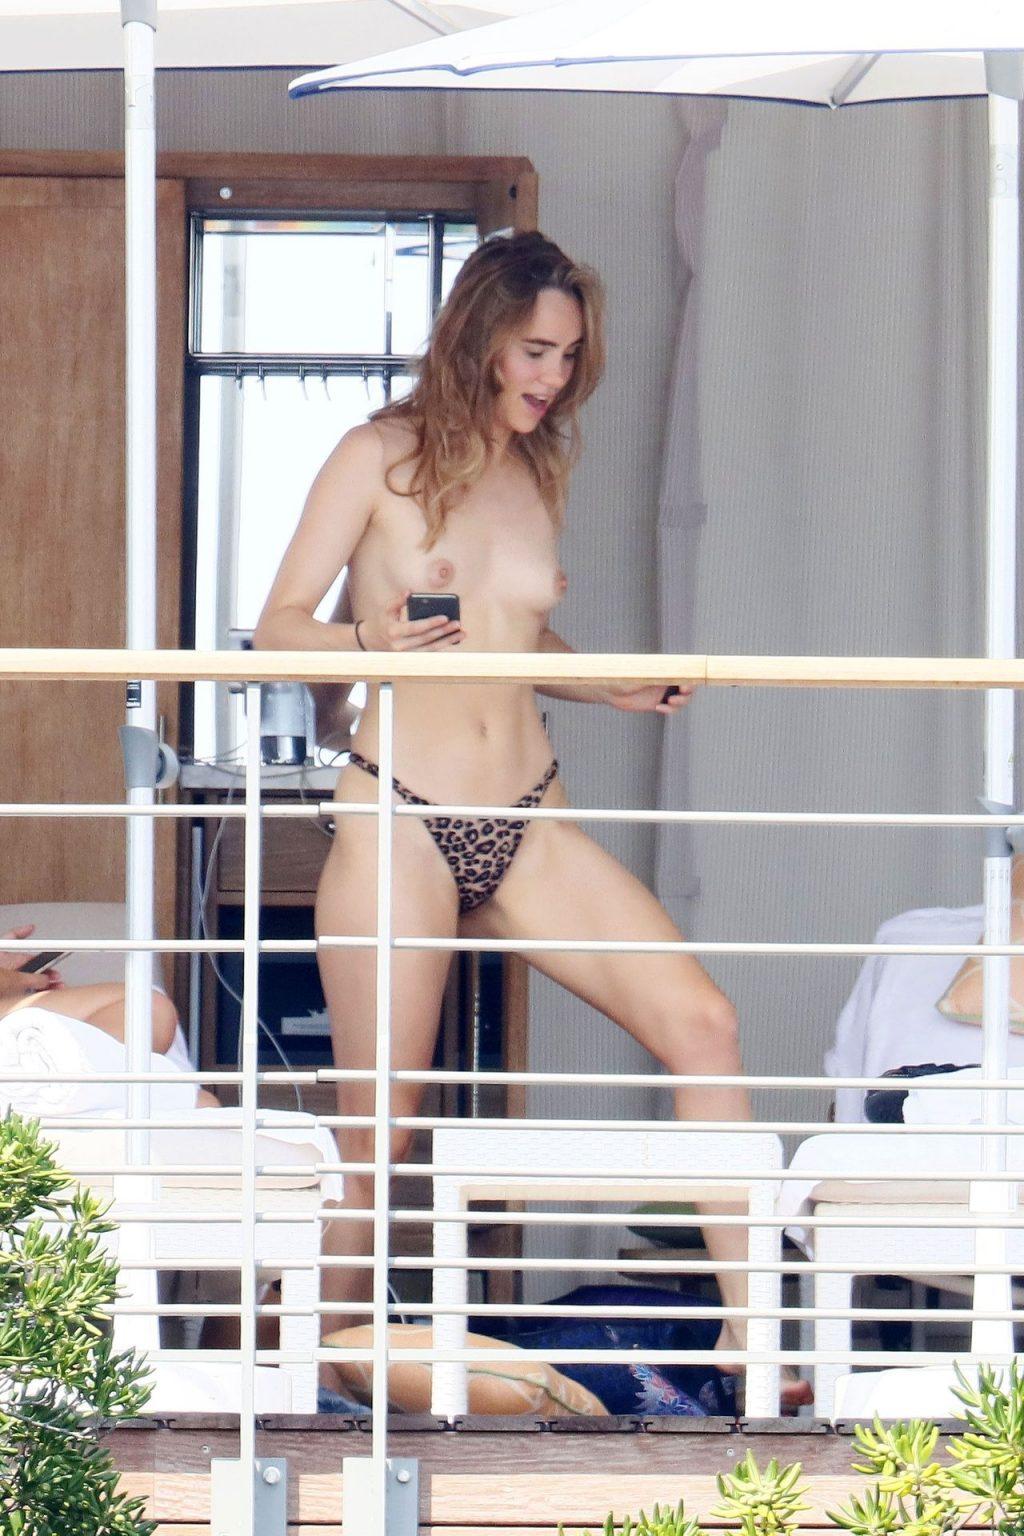 Suki Waterhouse Goes Nude While Sunbathing on Her Holiday in France (25 Photos)